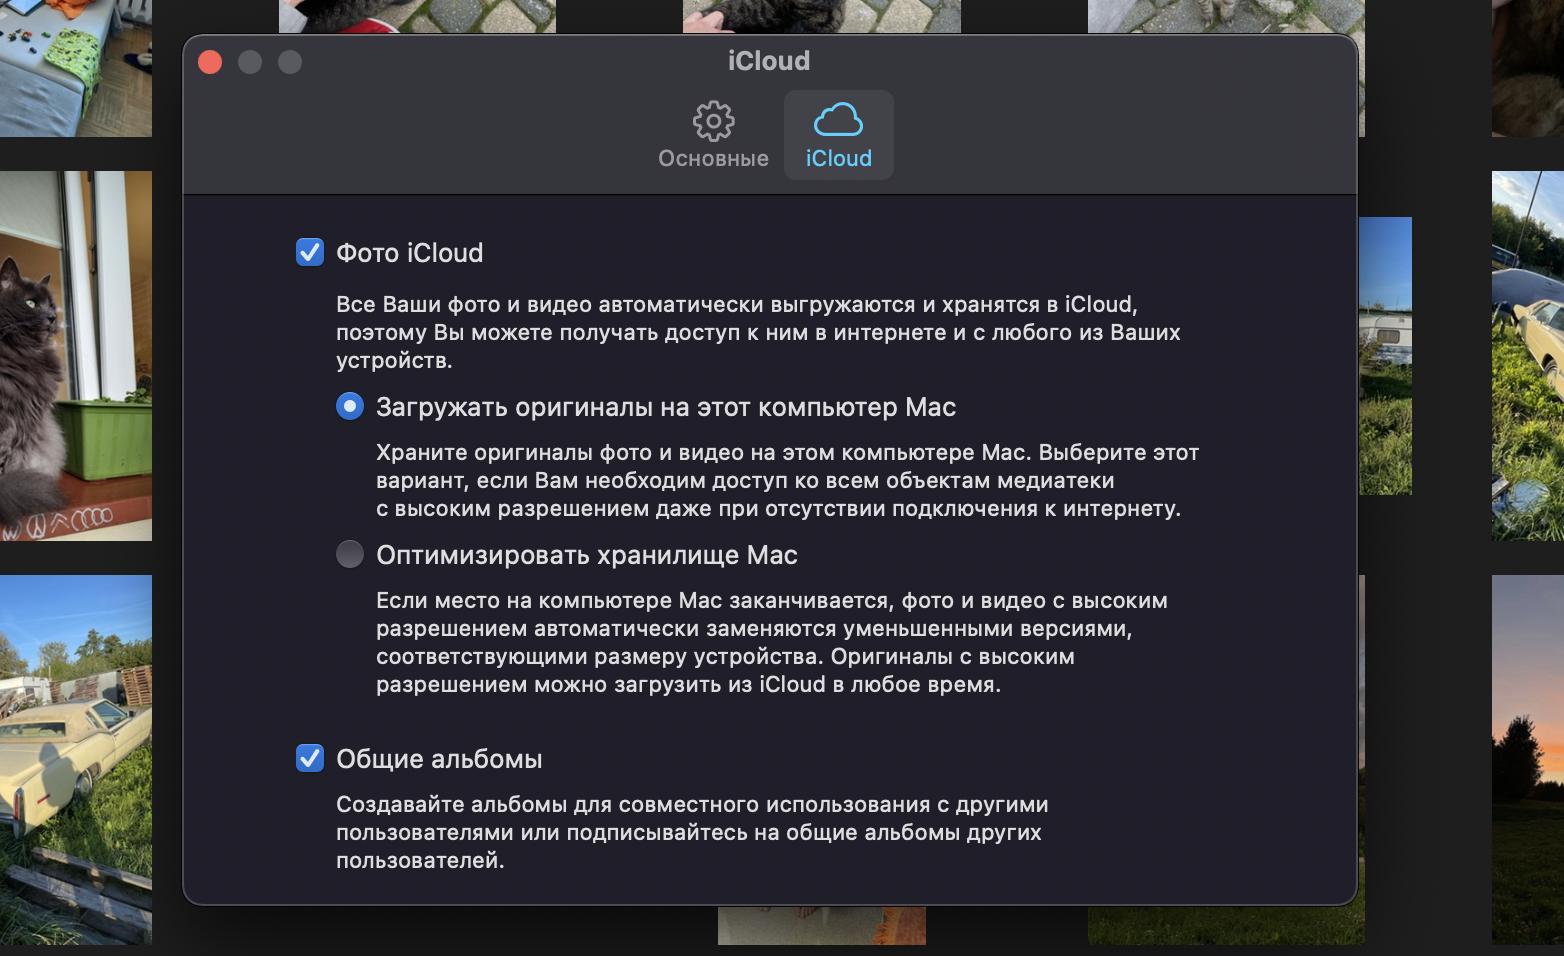 Использование функции «Фото iCloud»